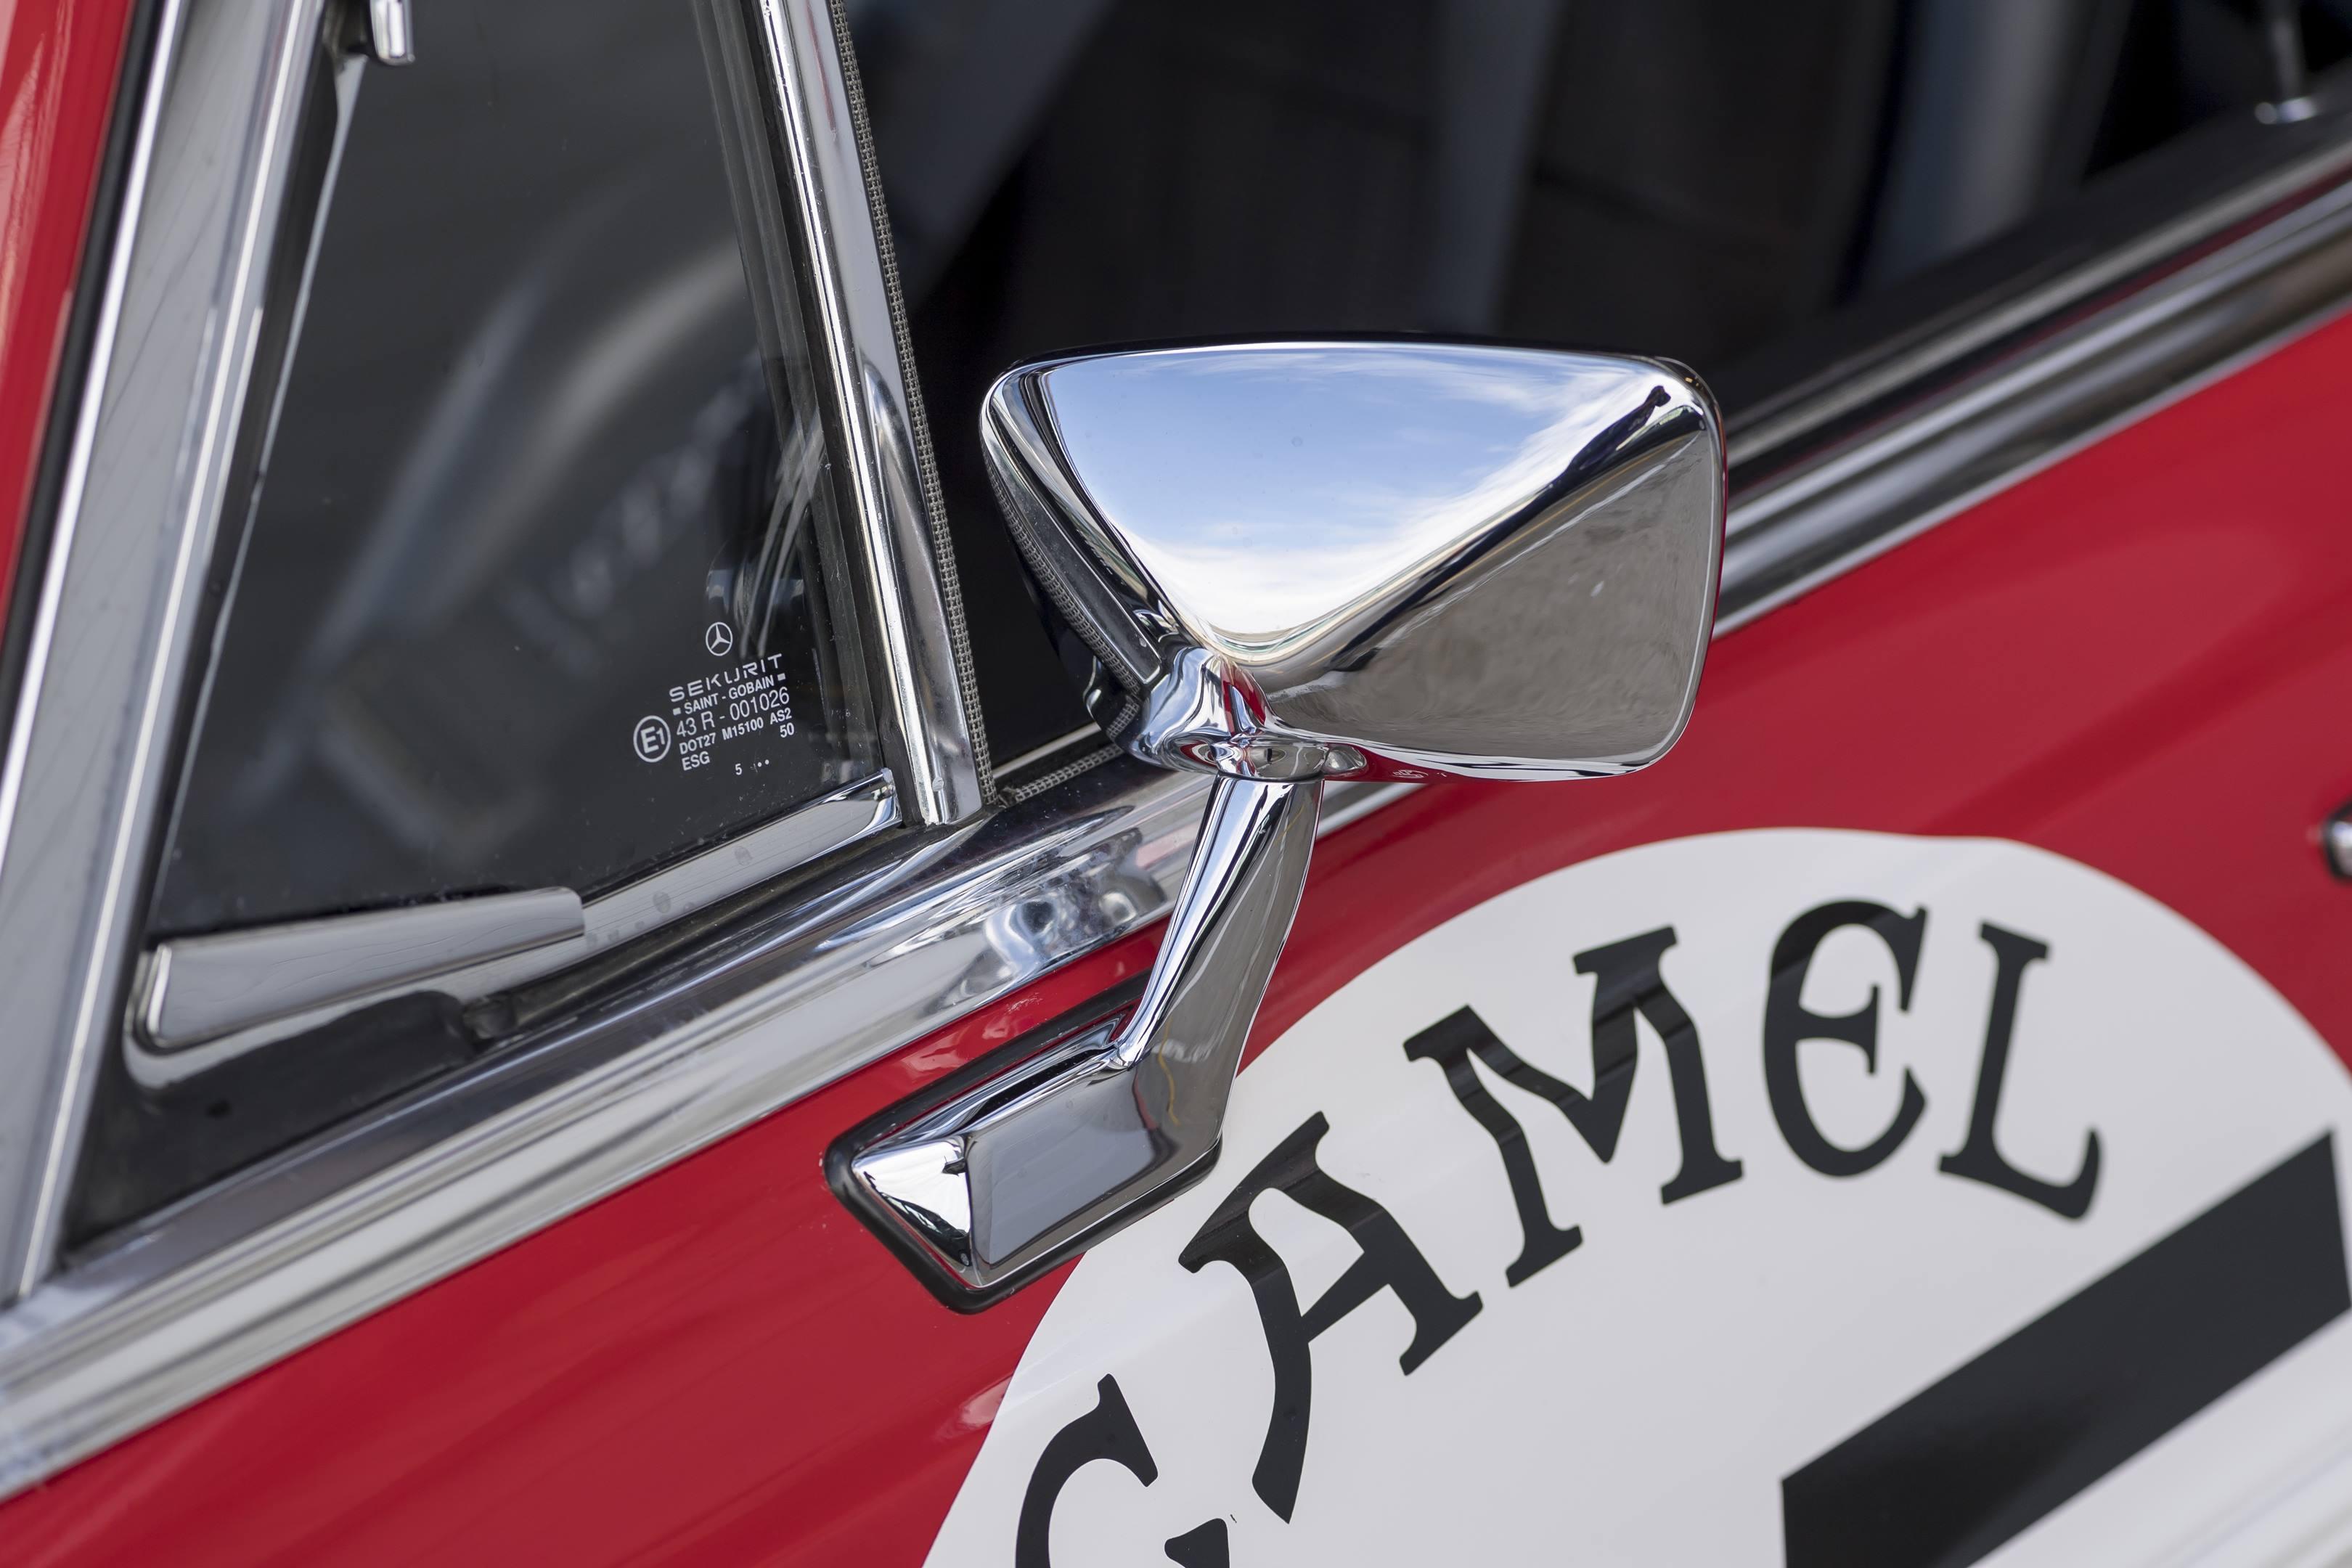 mercedes benz amg 300SEL 6.3 side mirror